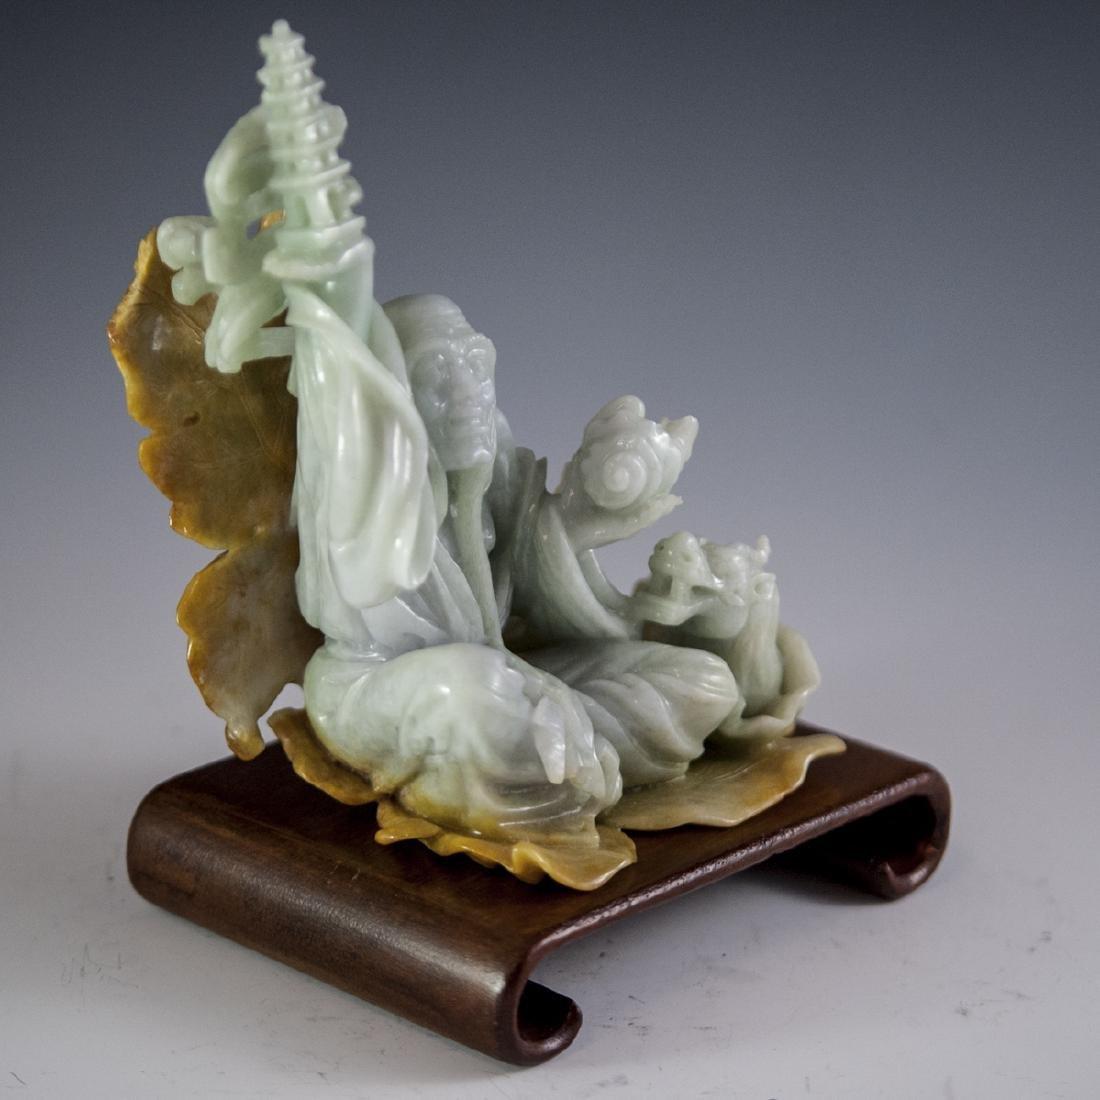 Chinese Carved Figural Jade Wiseman - 2